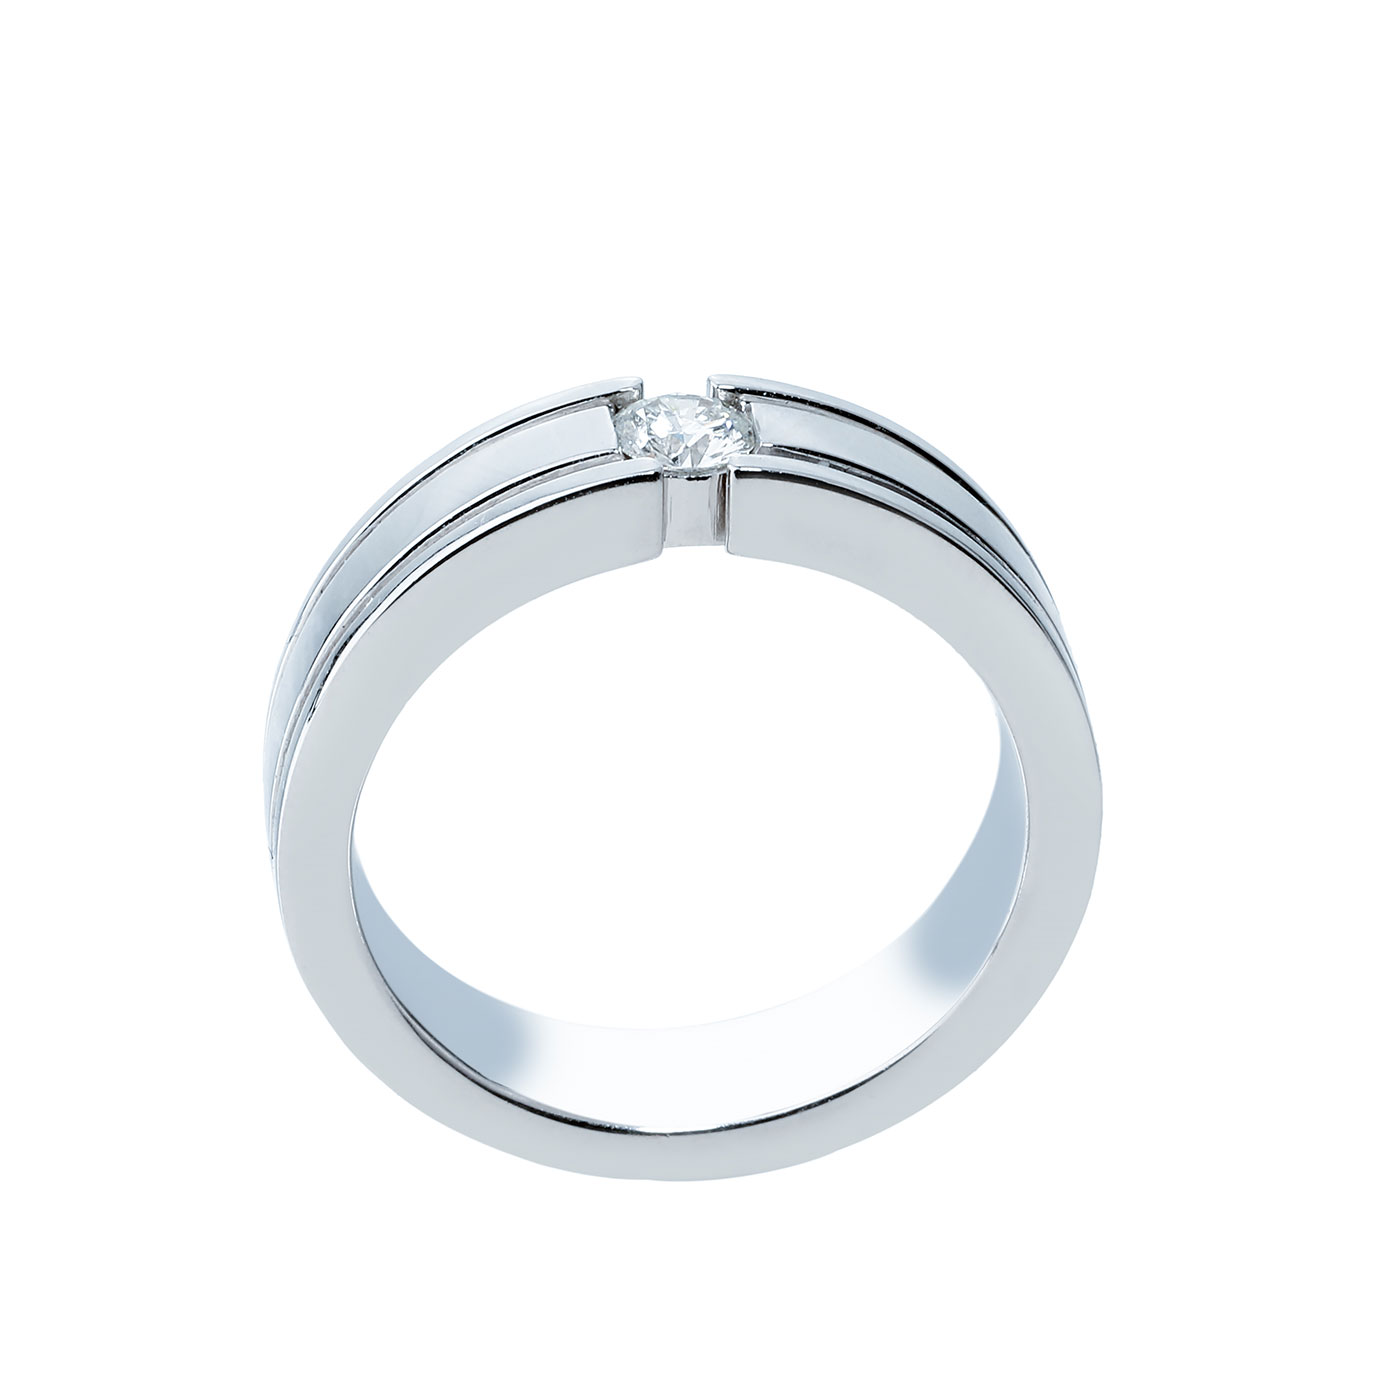 حلقه برليان 75338 C گوهربين goharbin